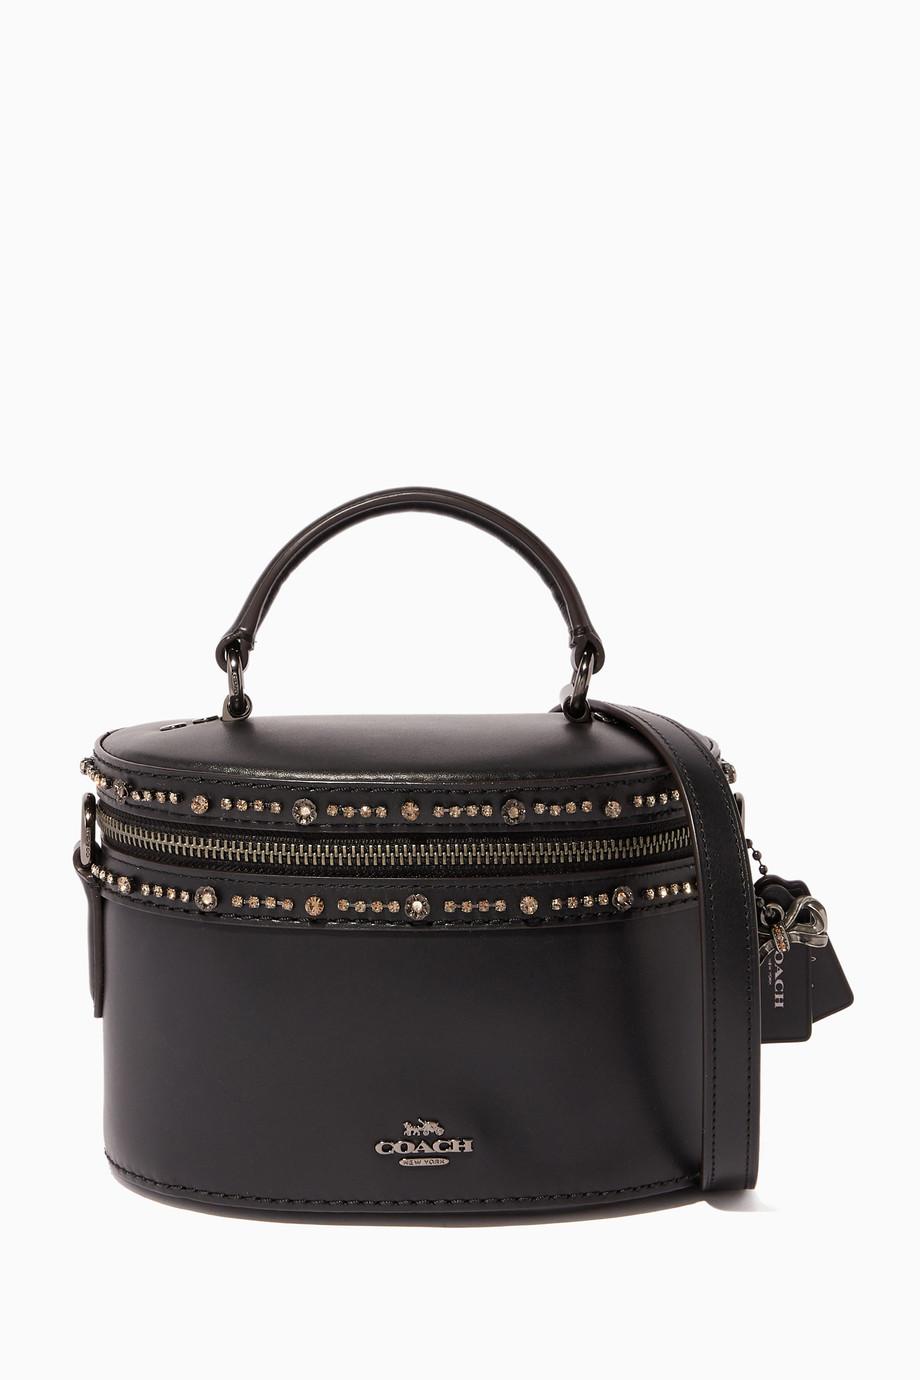 c8a3e1b4 Shop Coach Black Coach X Selena Gomez Crystal-Embellished ...